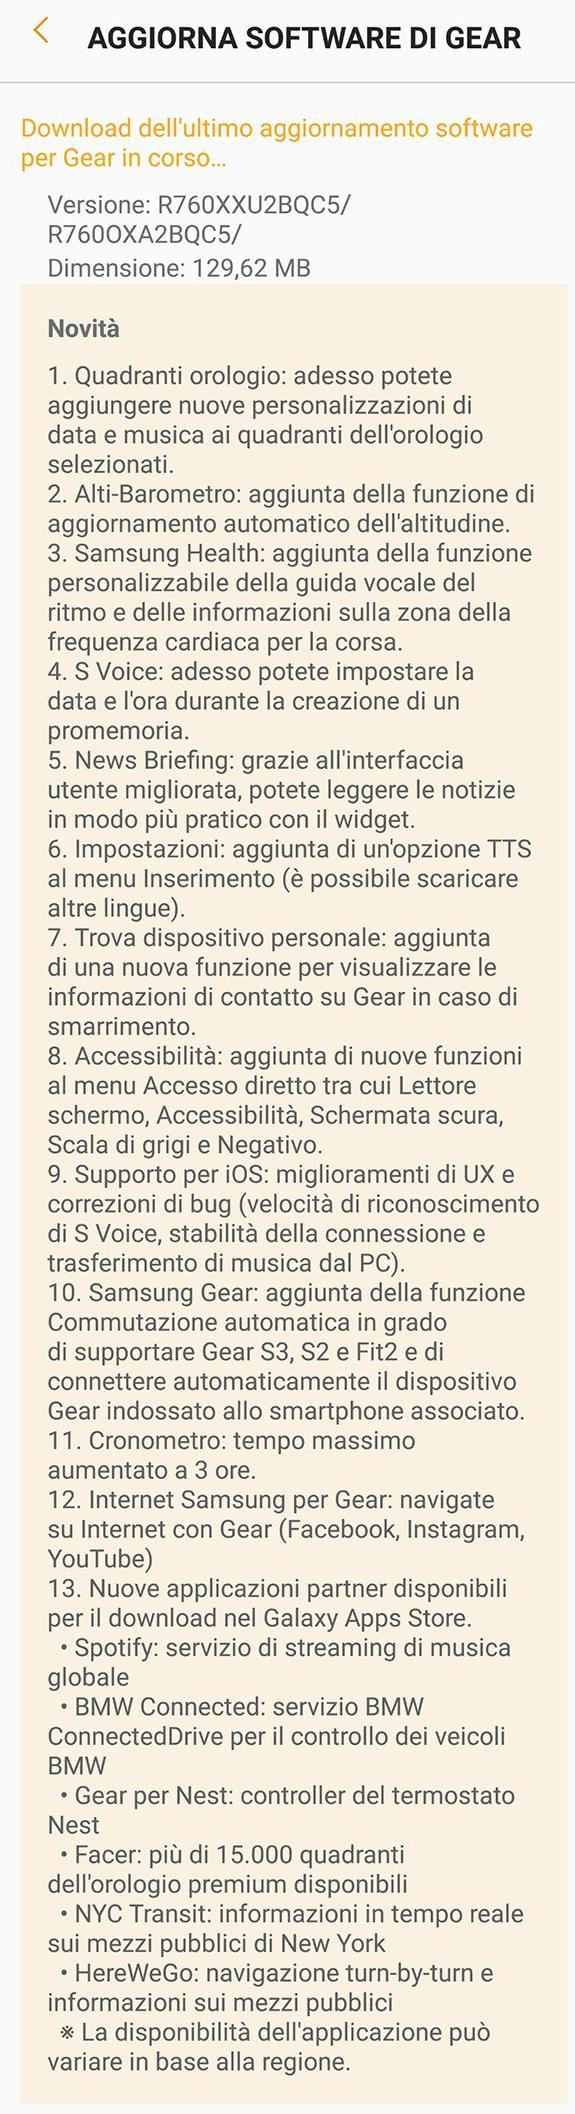 Gear S3 classic e Gear S3 Frontier update